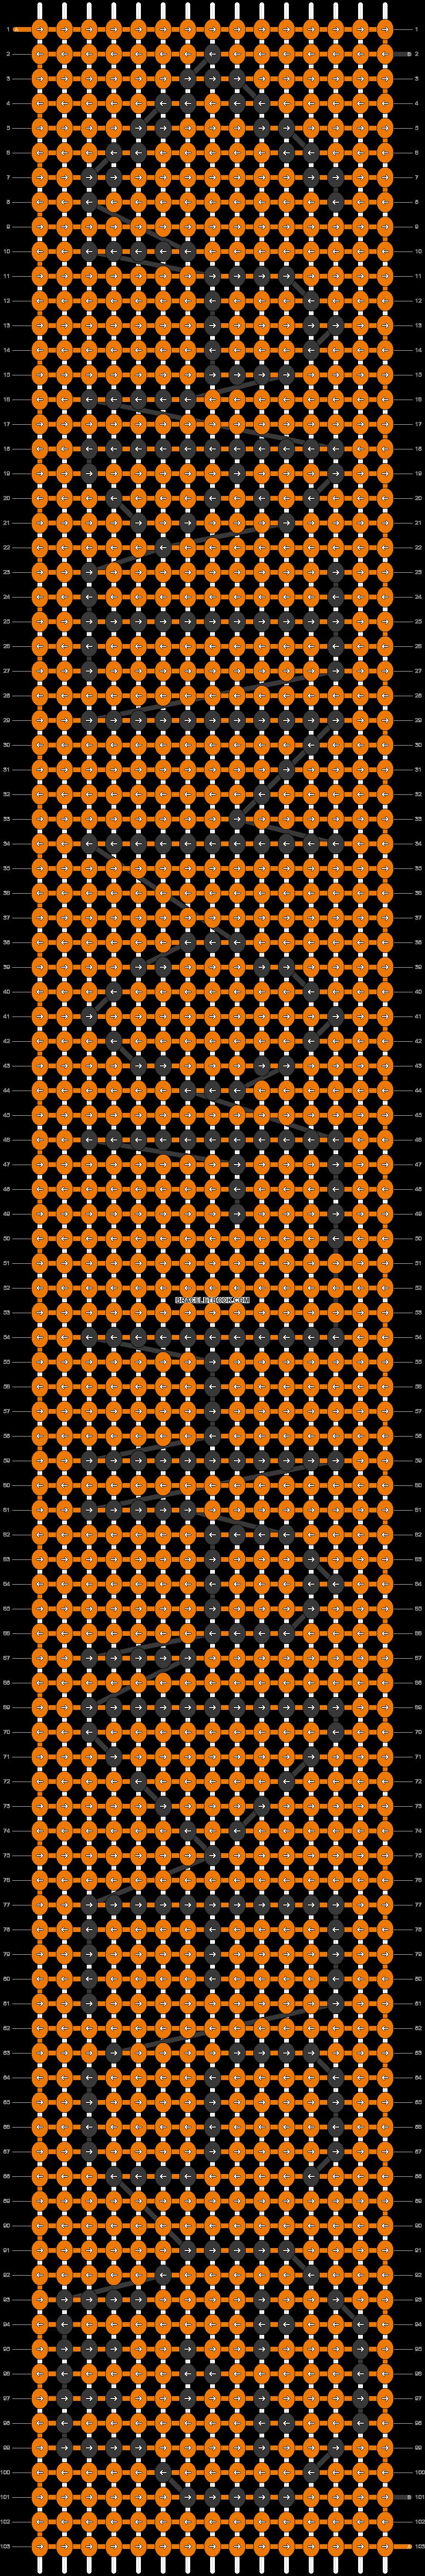 Alpha pattern #75373 pattern